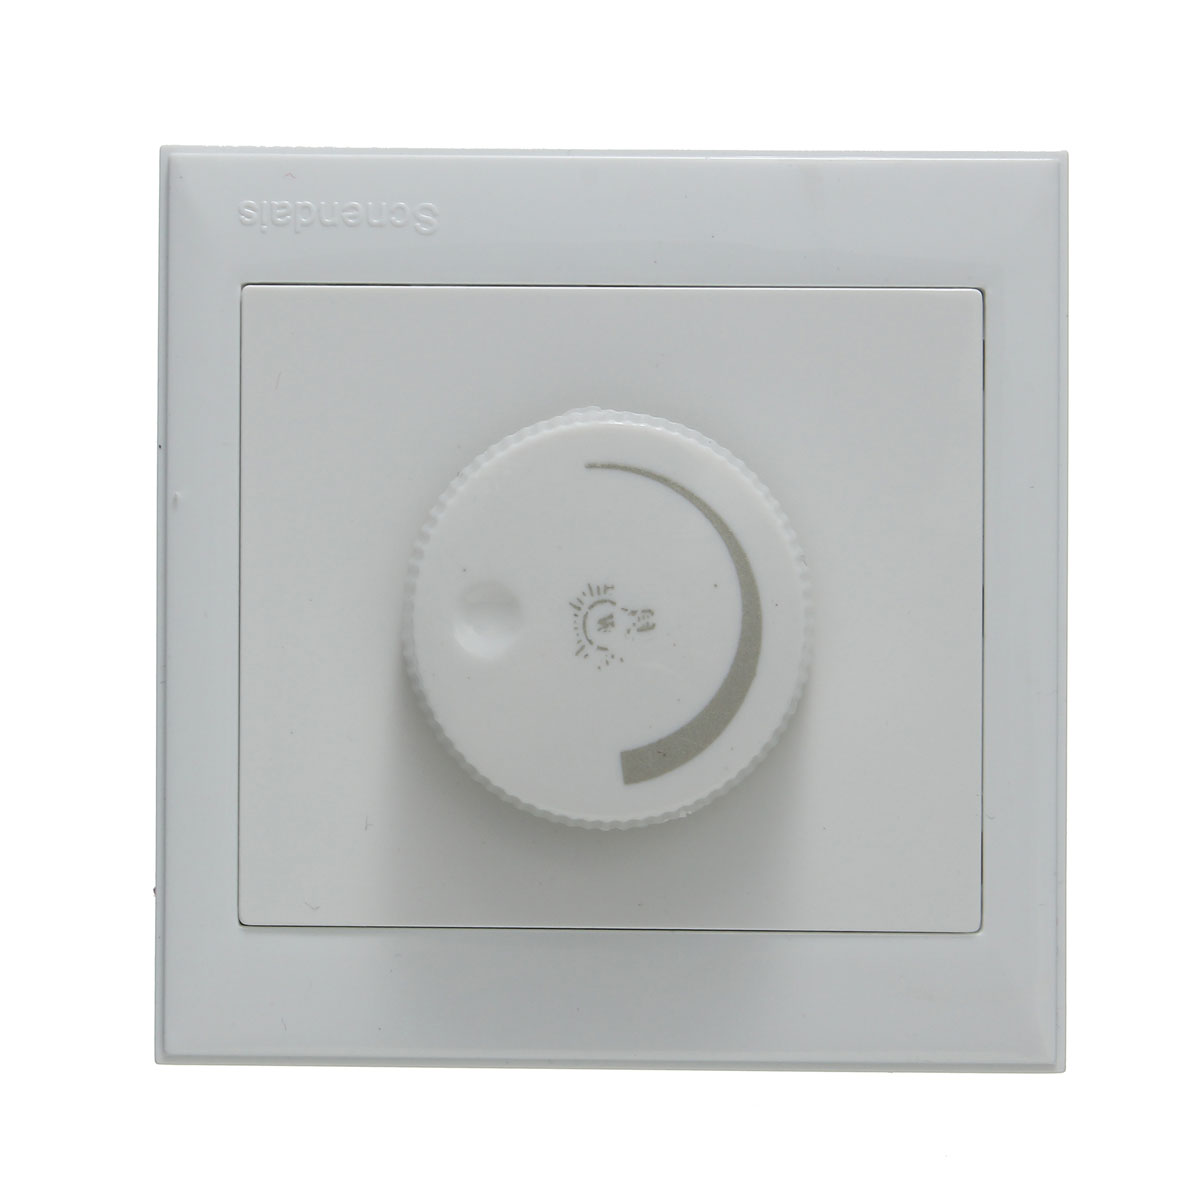 AC 220V White LED Dimmer Switch Adjustable Controller LED Driver Dimmer For Dimmable Panel Light Downlight Spotlight LED BulbAC 220V White LED Dimmer Switch Adjustable Controller LED Driver Dimmer For Dimmable Panel Light Downlight Spotlight LED Bulb